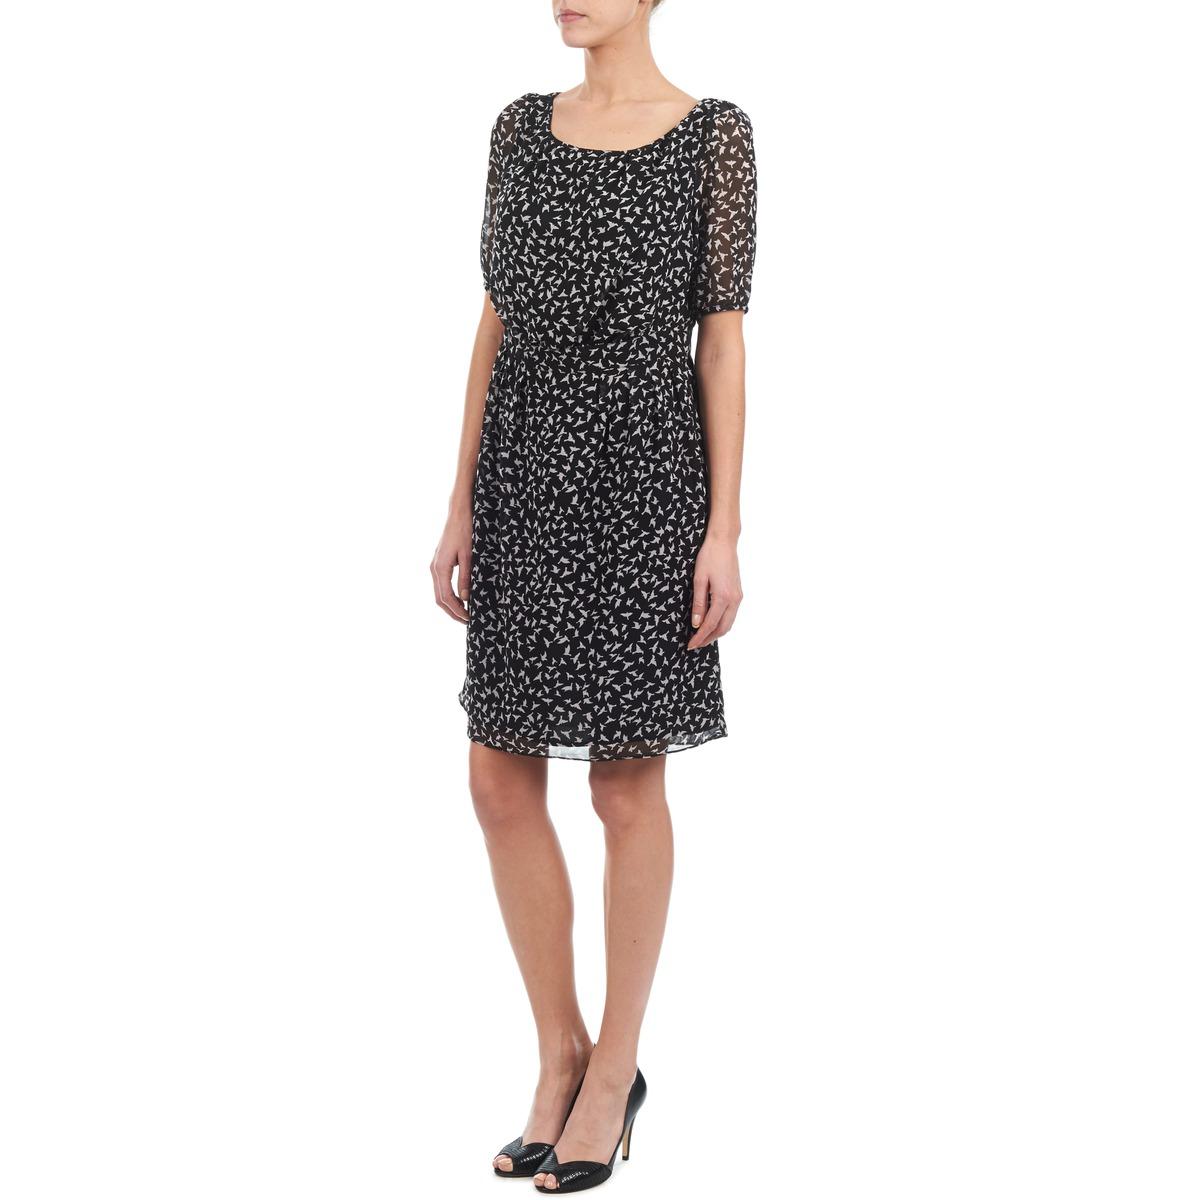 527ac8bf0fc Κοντά Φορέματα Mexx 13LW130 Σύνθεση: Πολυεστέρας, ΓΥΝΑΙΚΑ | ΡΟΥΧΑ ...